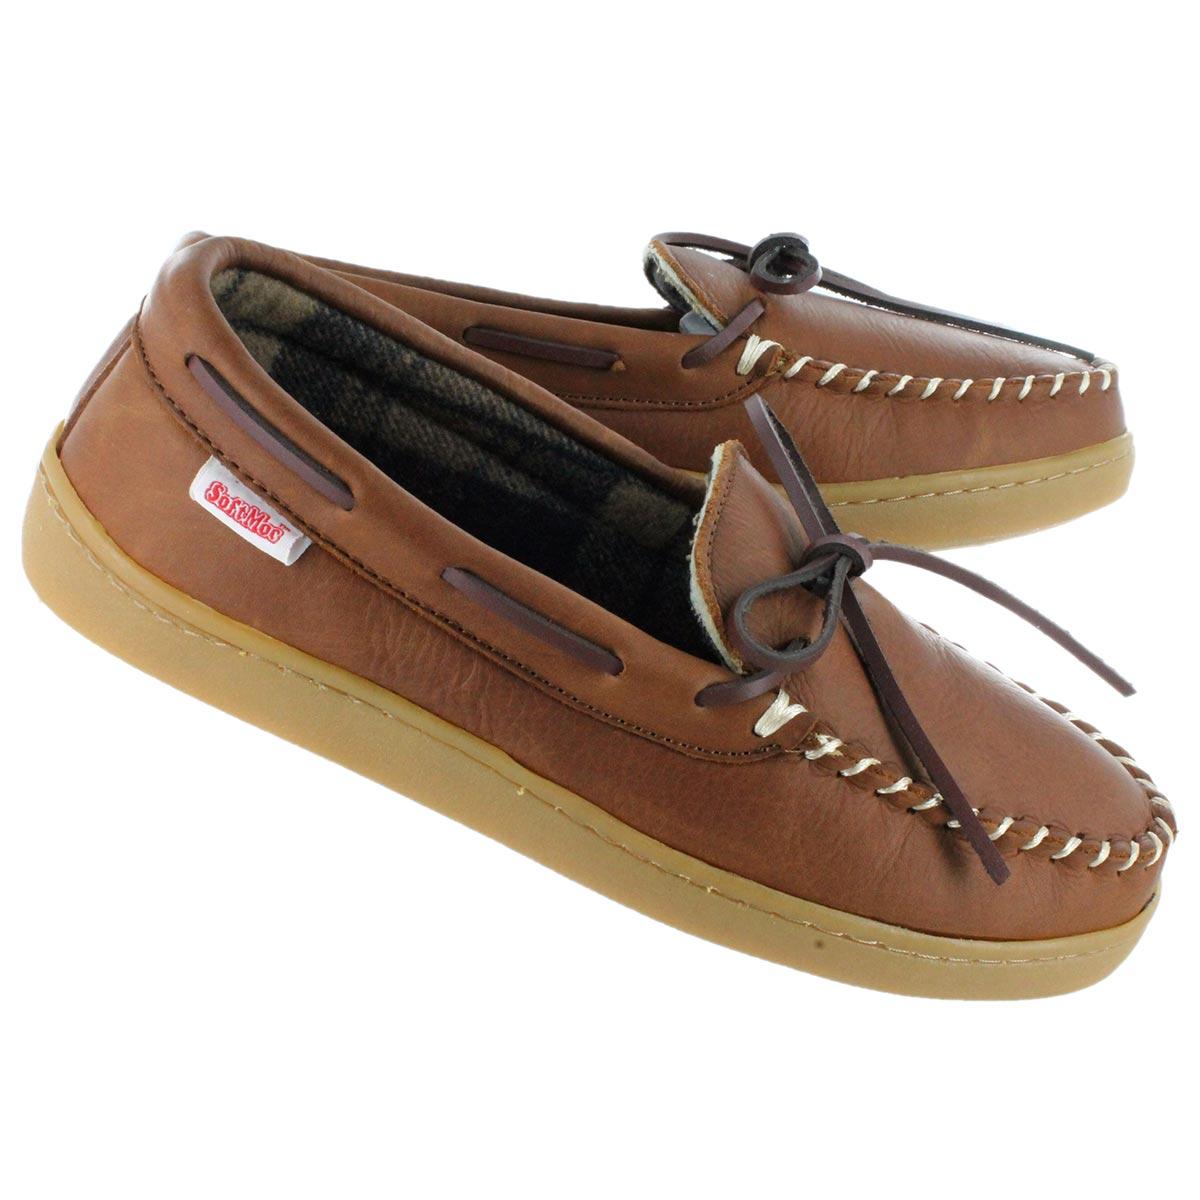 Mns Conrad 2 brn leather moccasin